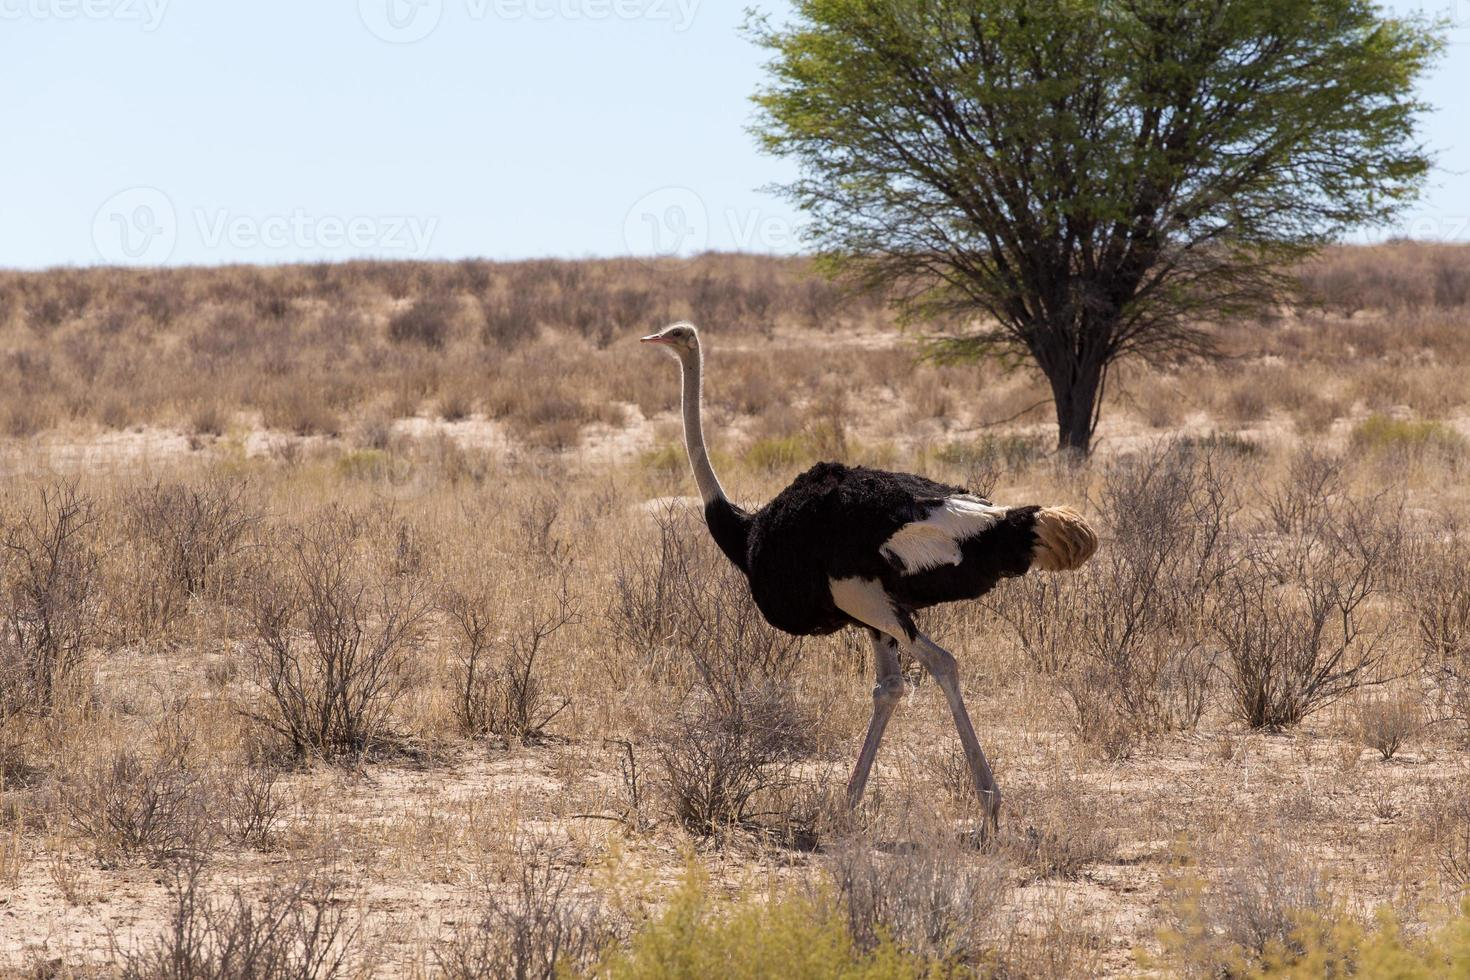 struisvogel struthio camelus, in kgalagadi, Zuid-Afrika foto